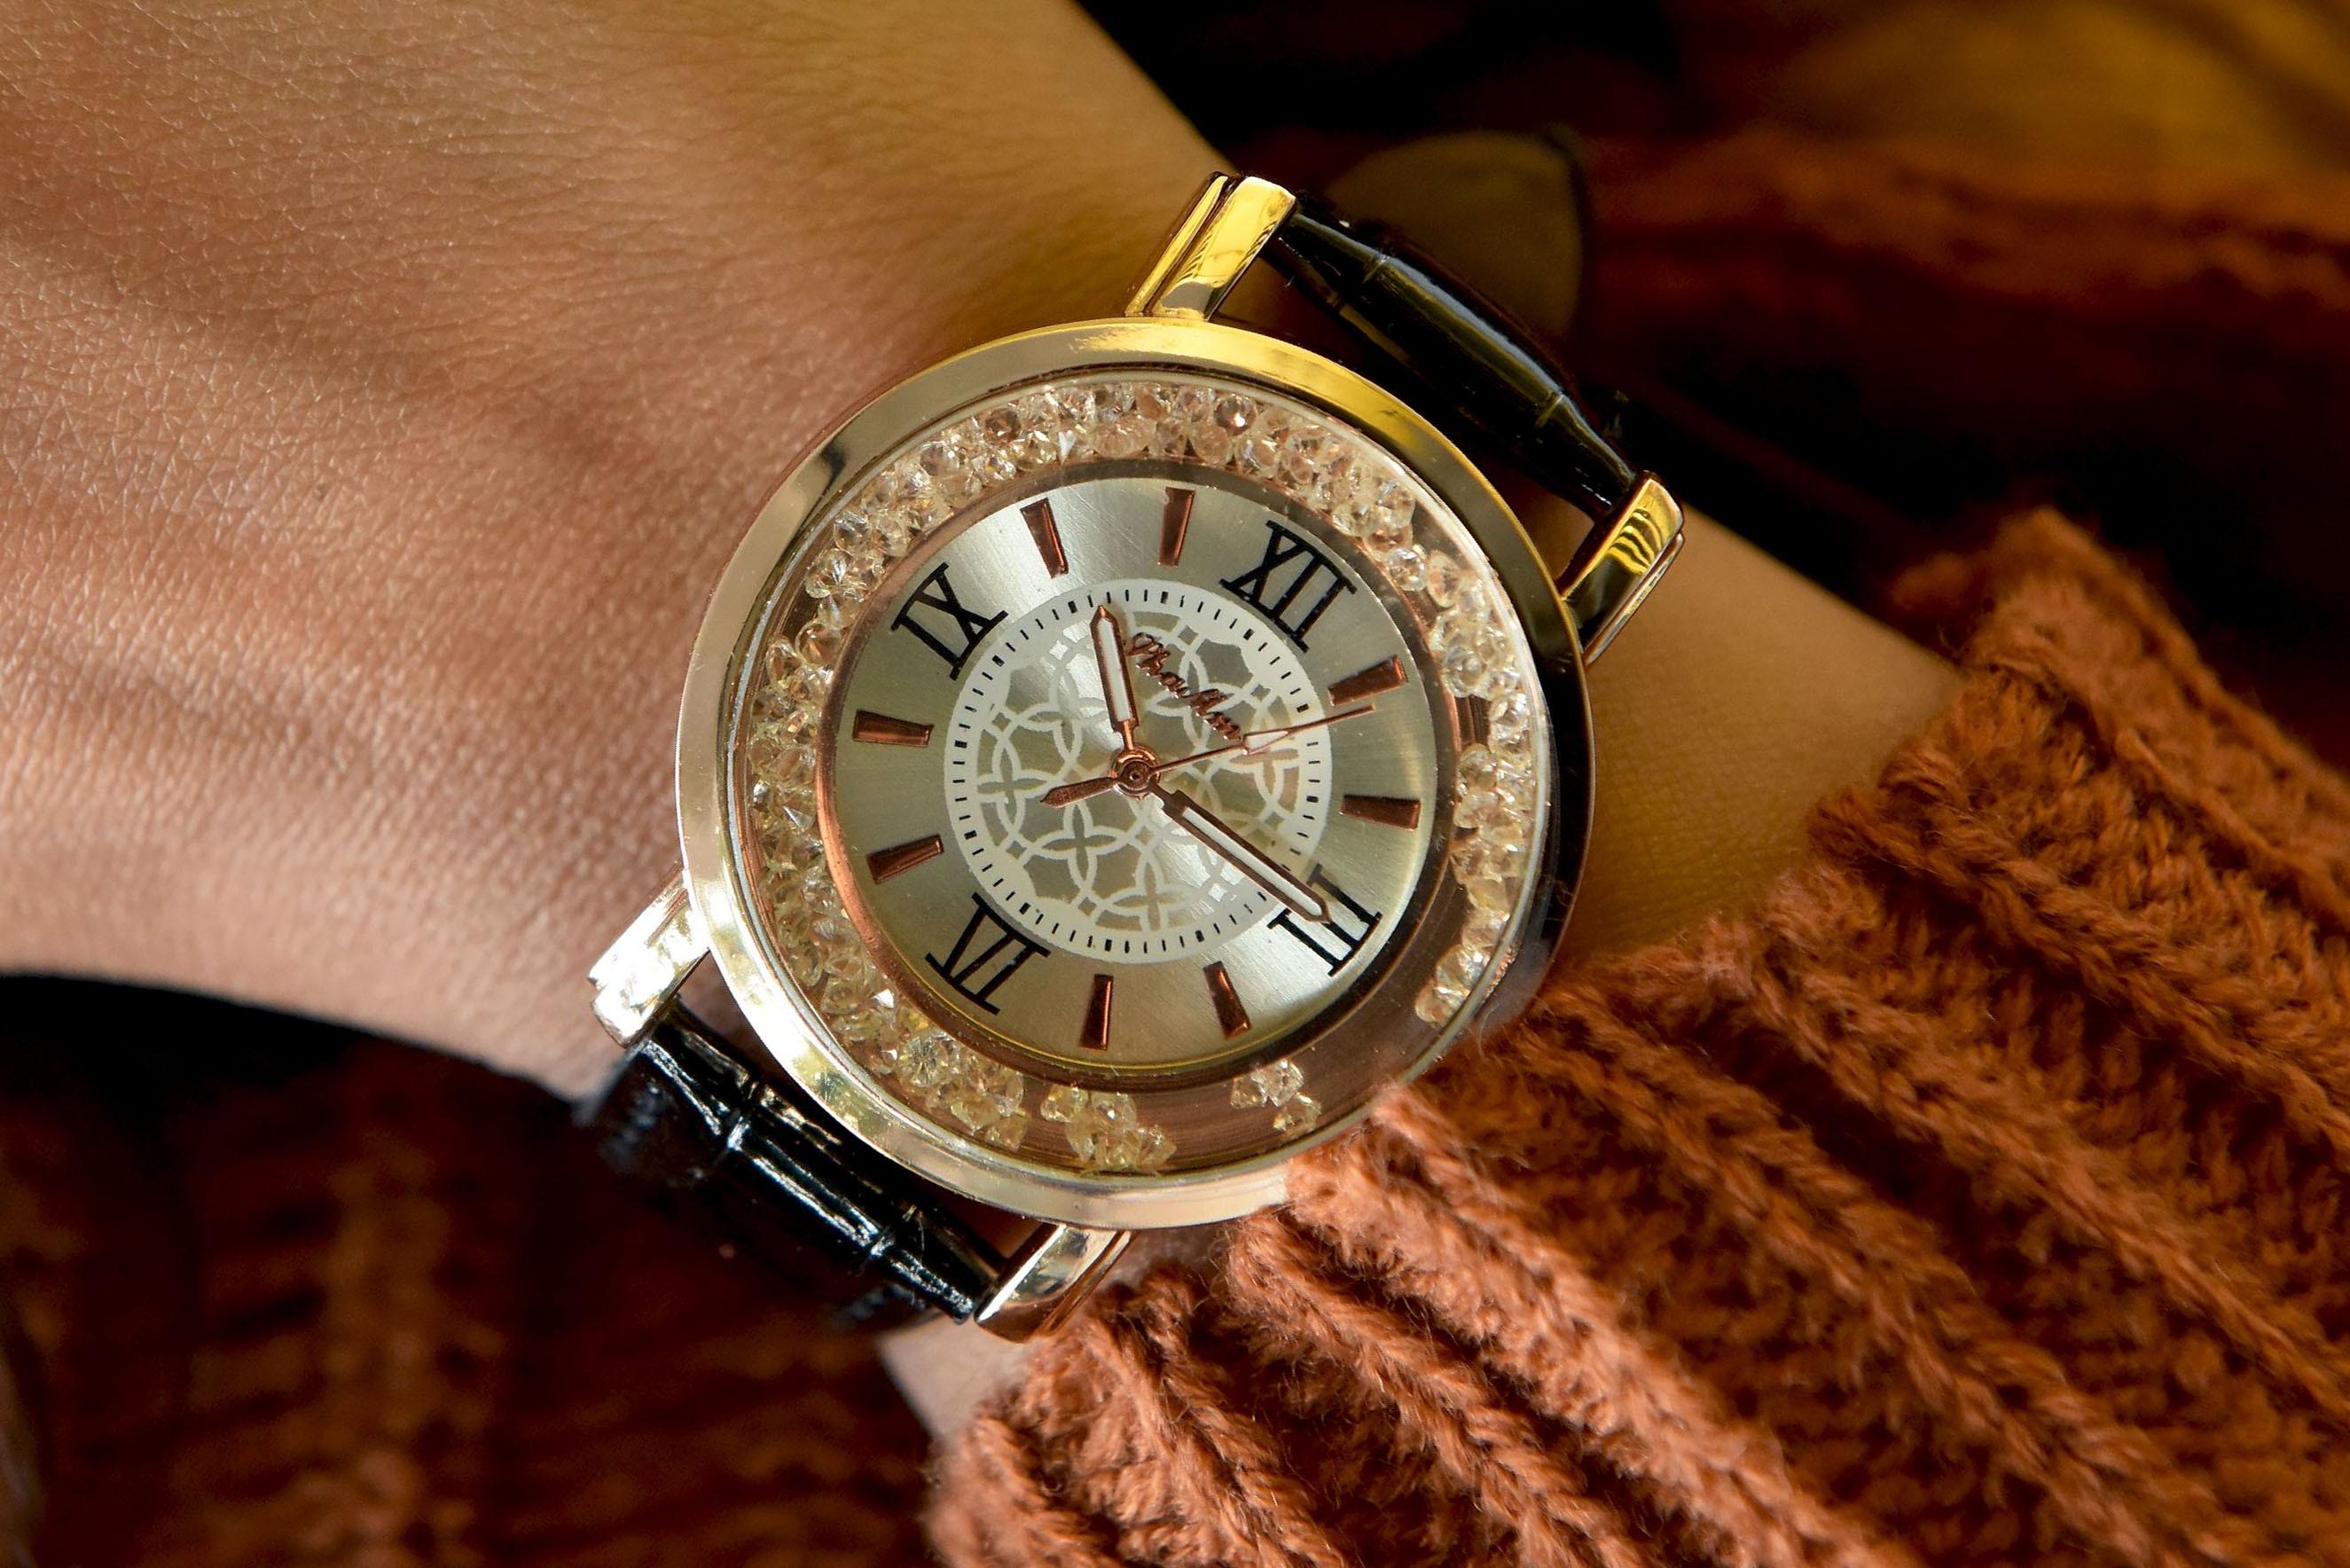 Womens - Pearl black strap watch